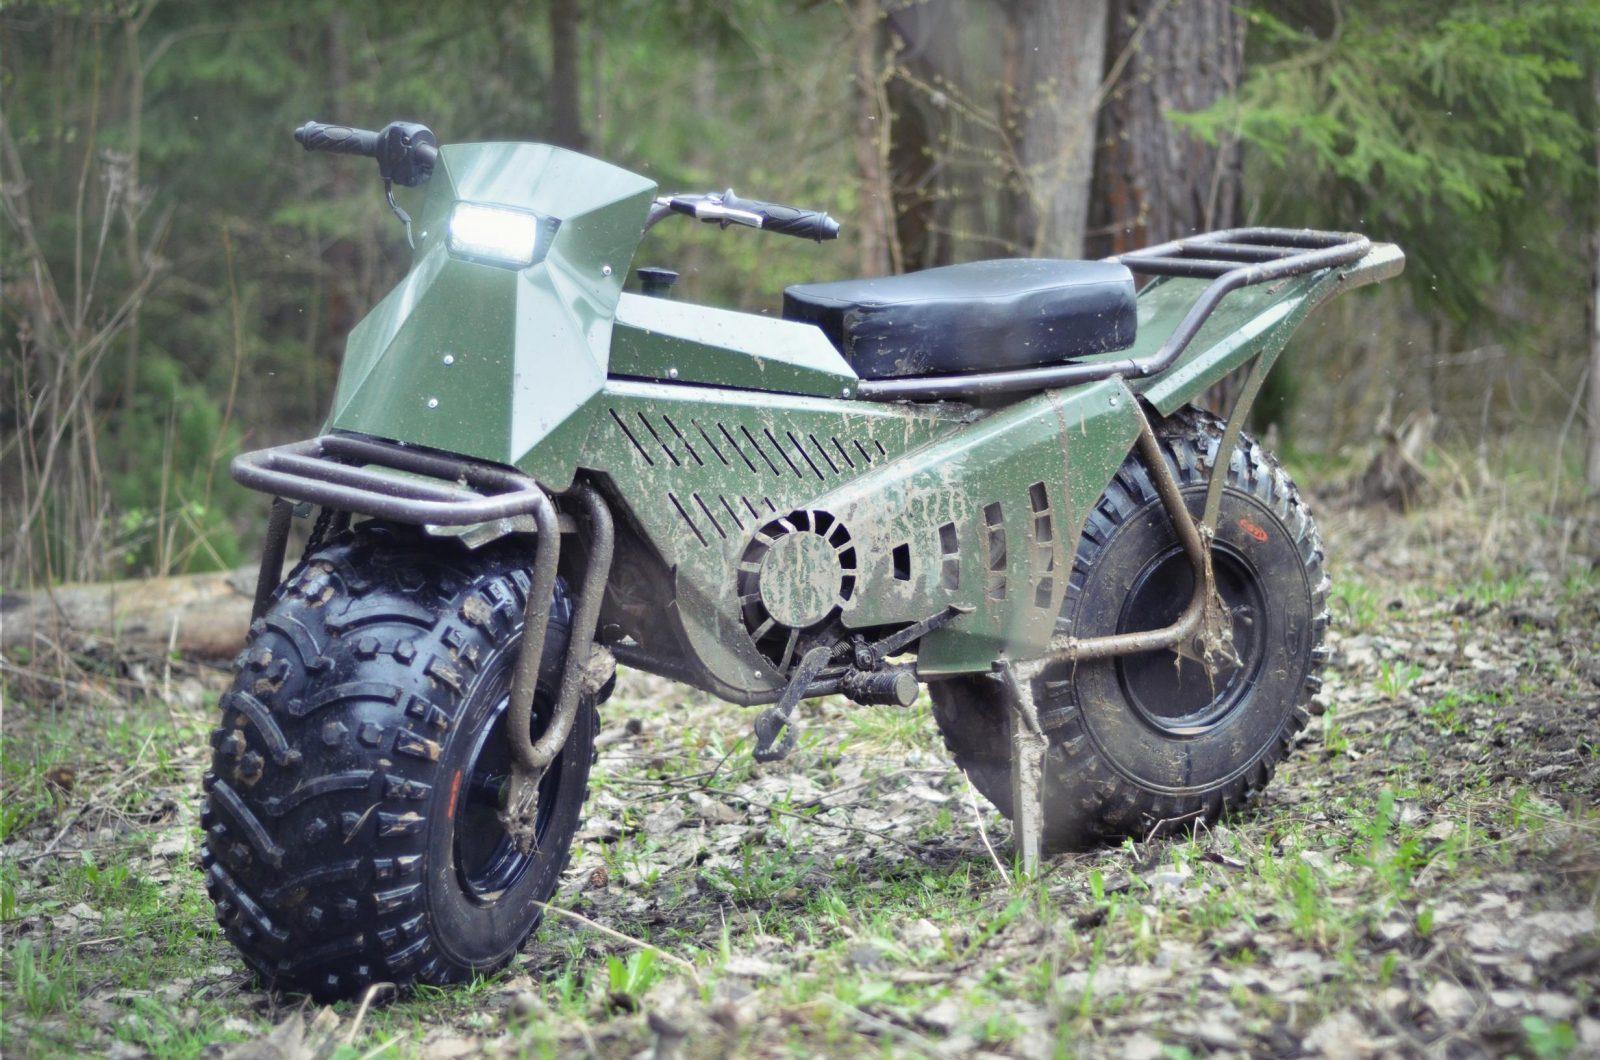 Taurus 2X2 Adventure Motorcycle 1600x1060 - Taurus 2x2 Adventure Motorcycle